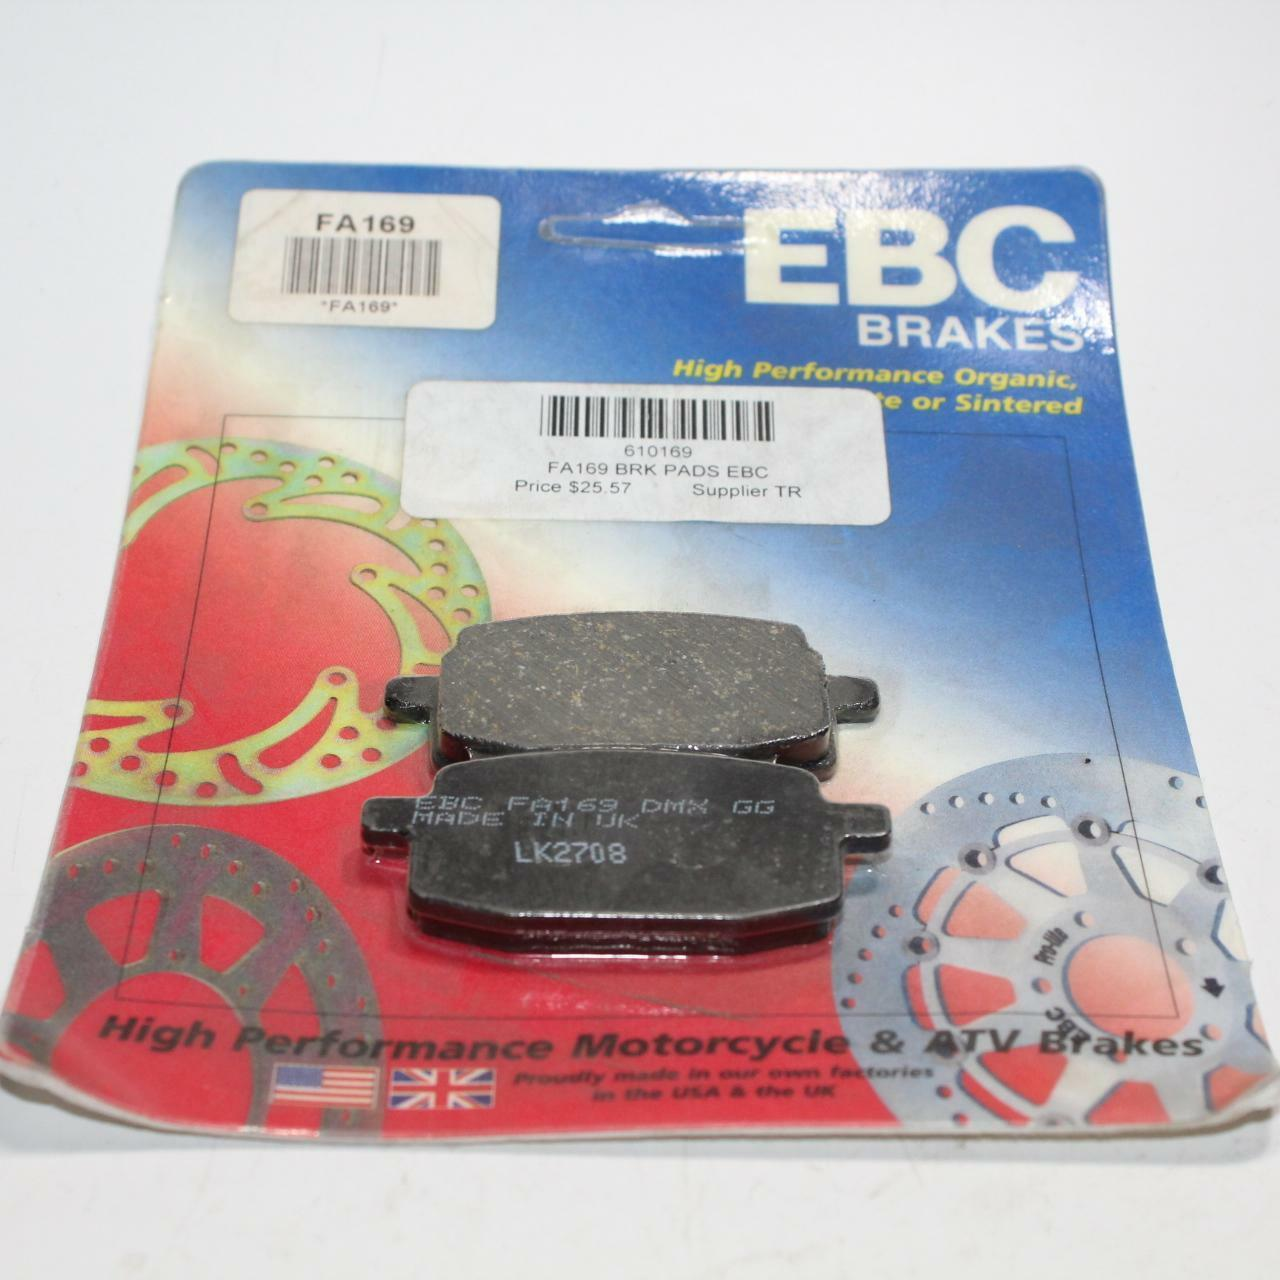 EBC Brakes Organic Front Brake Pads Yamaha Zuma YW50 2002-2010 NOS 1 SET